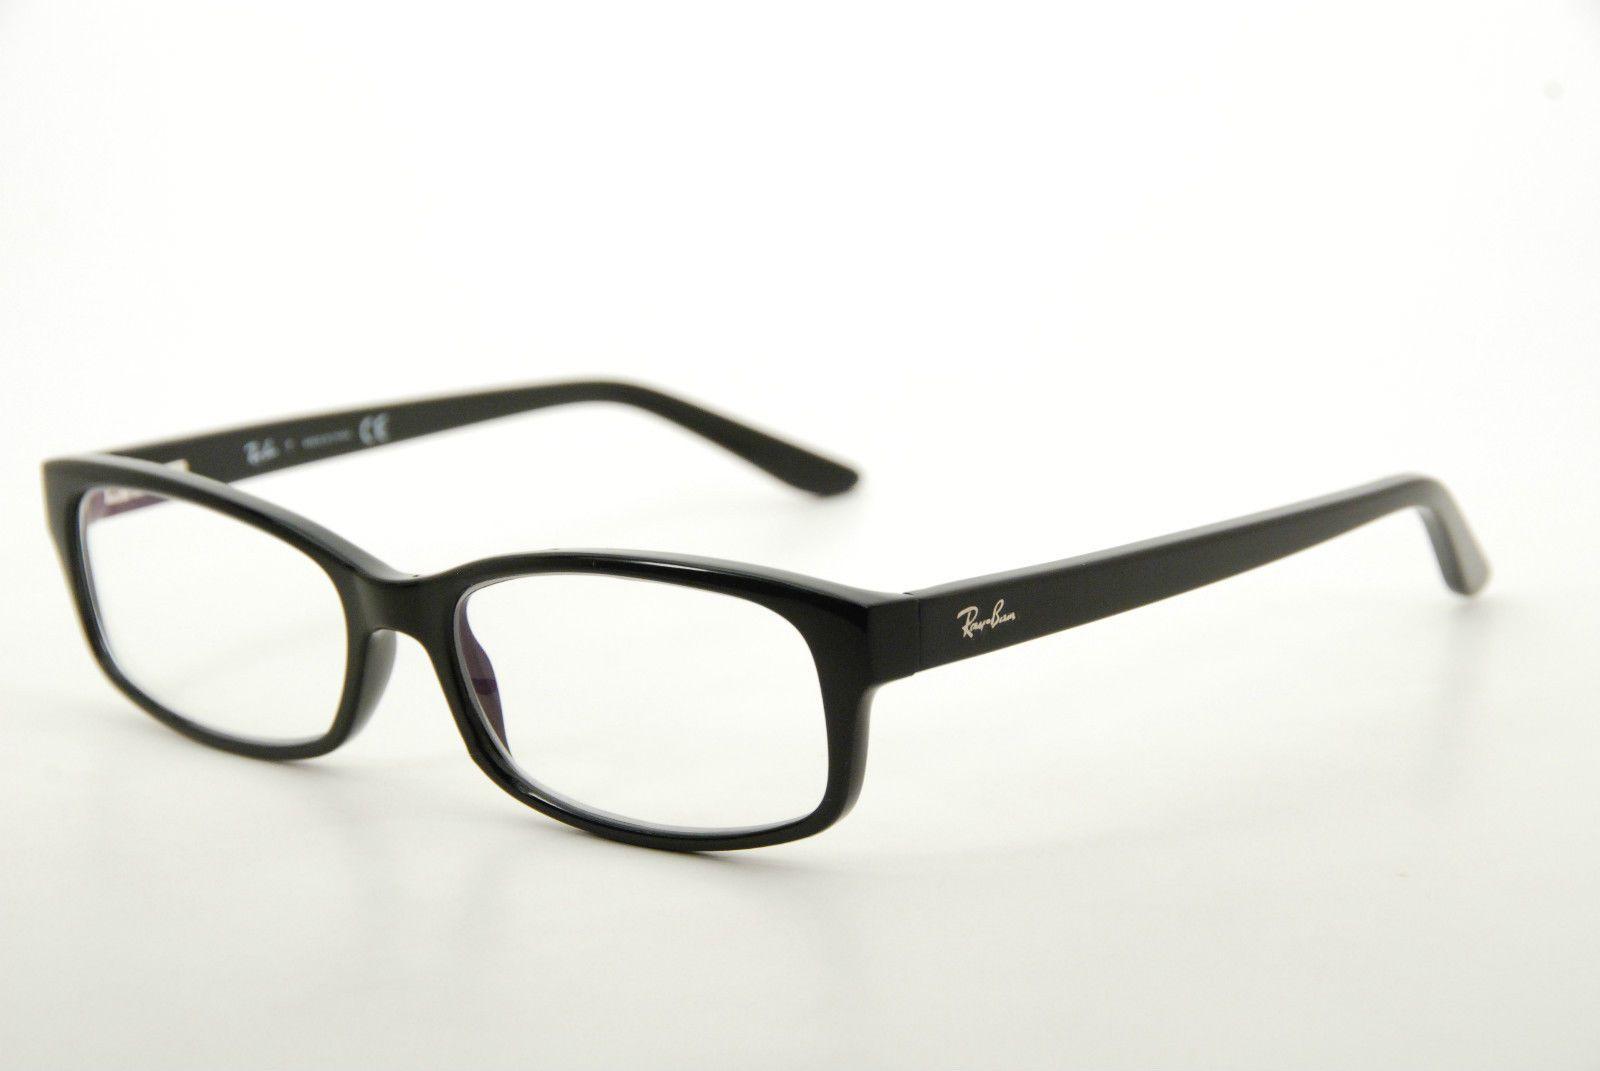 744bd87568 New Authentic Ray Ban RB 5187 2000 Black 50mm Frames Eyeglasses RX (eBay  Link)